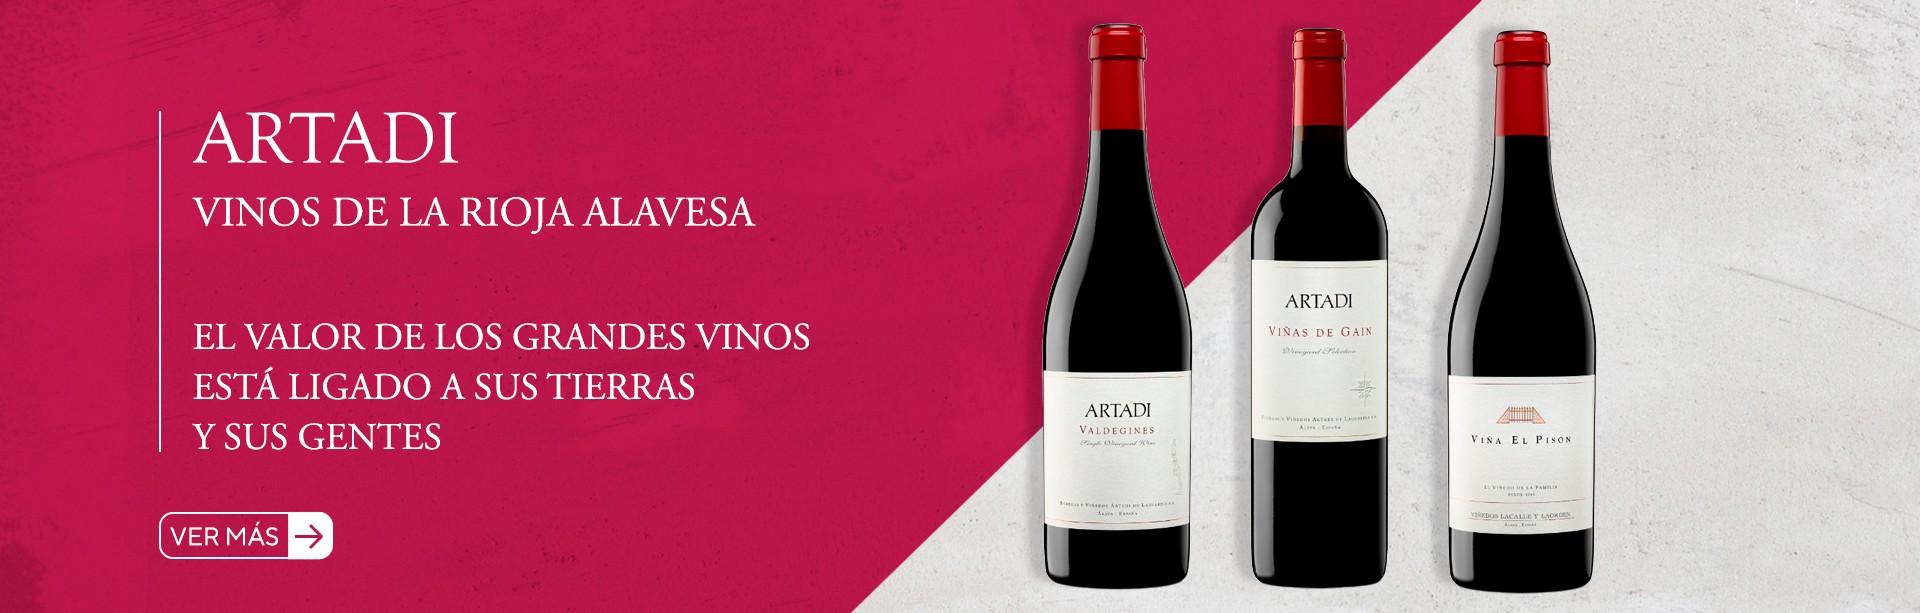 ARTADi Bodegas y Viñedos